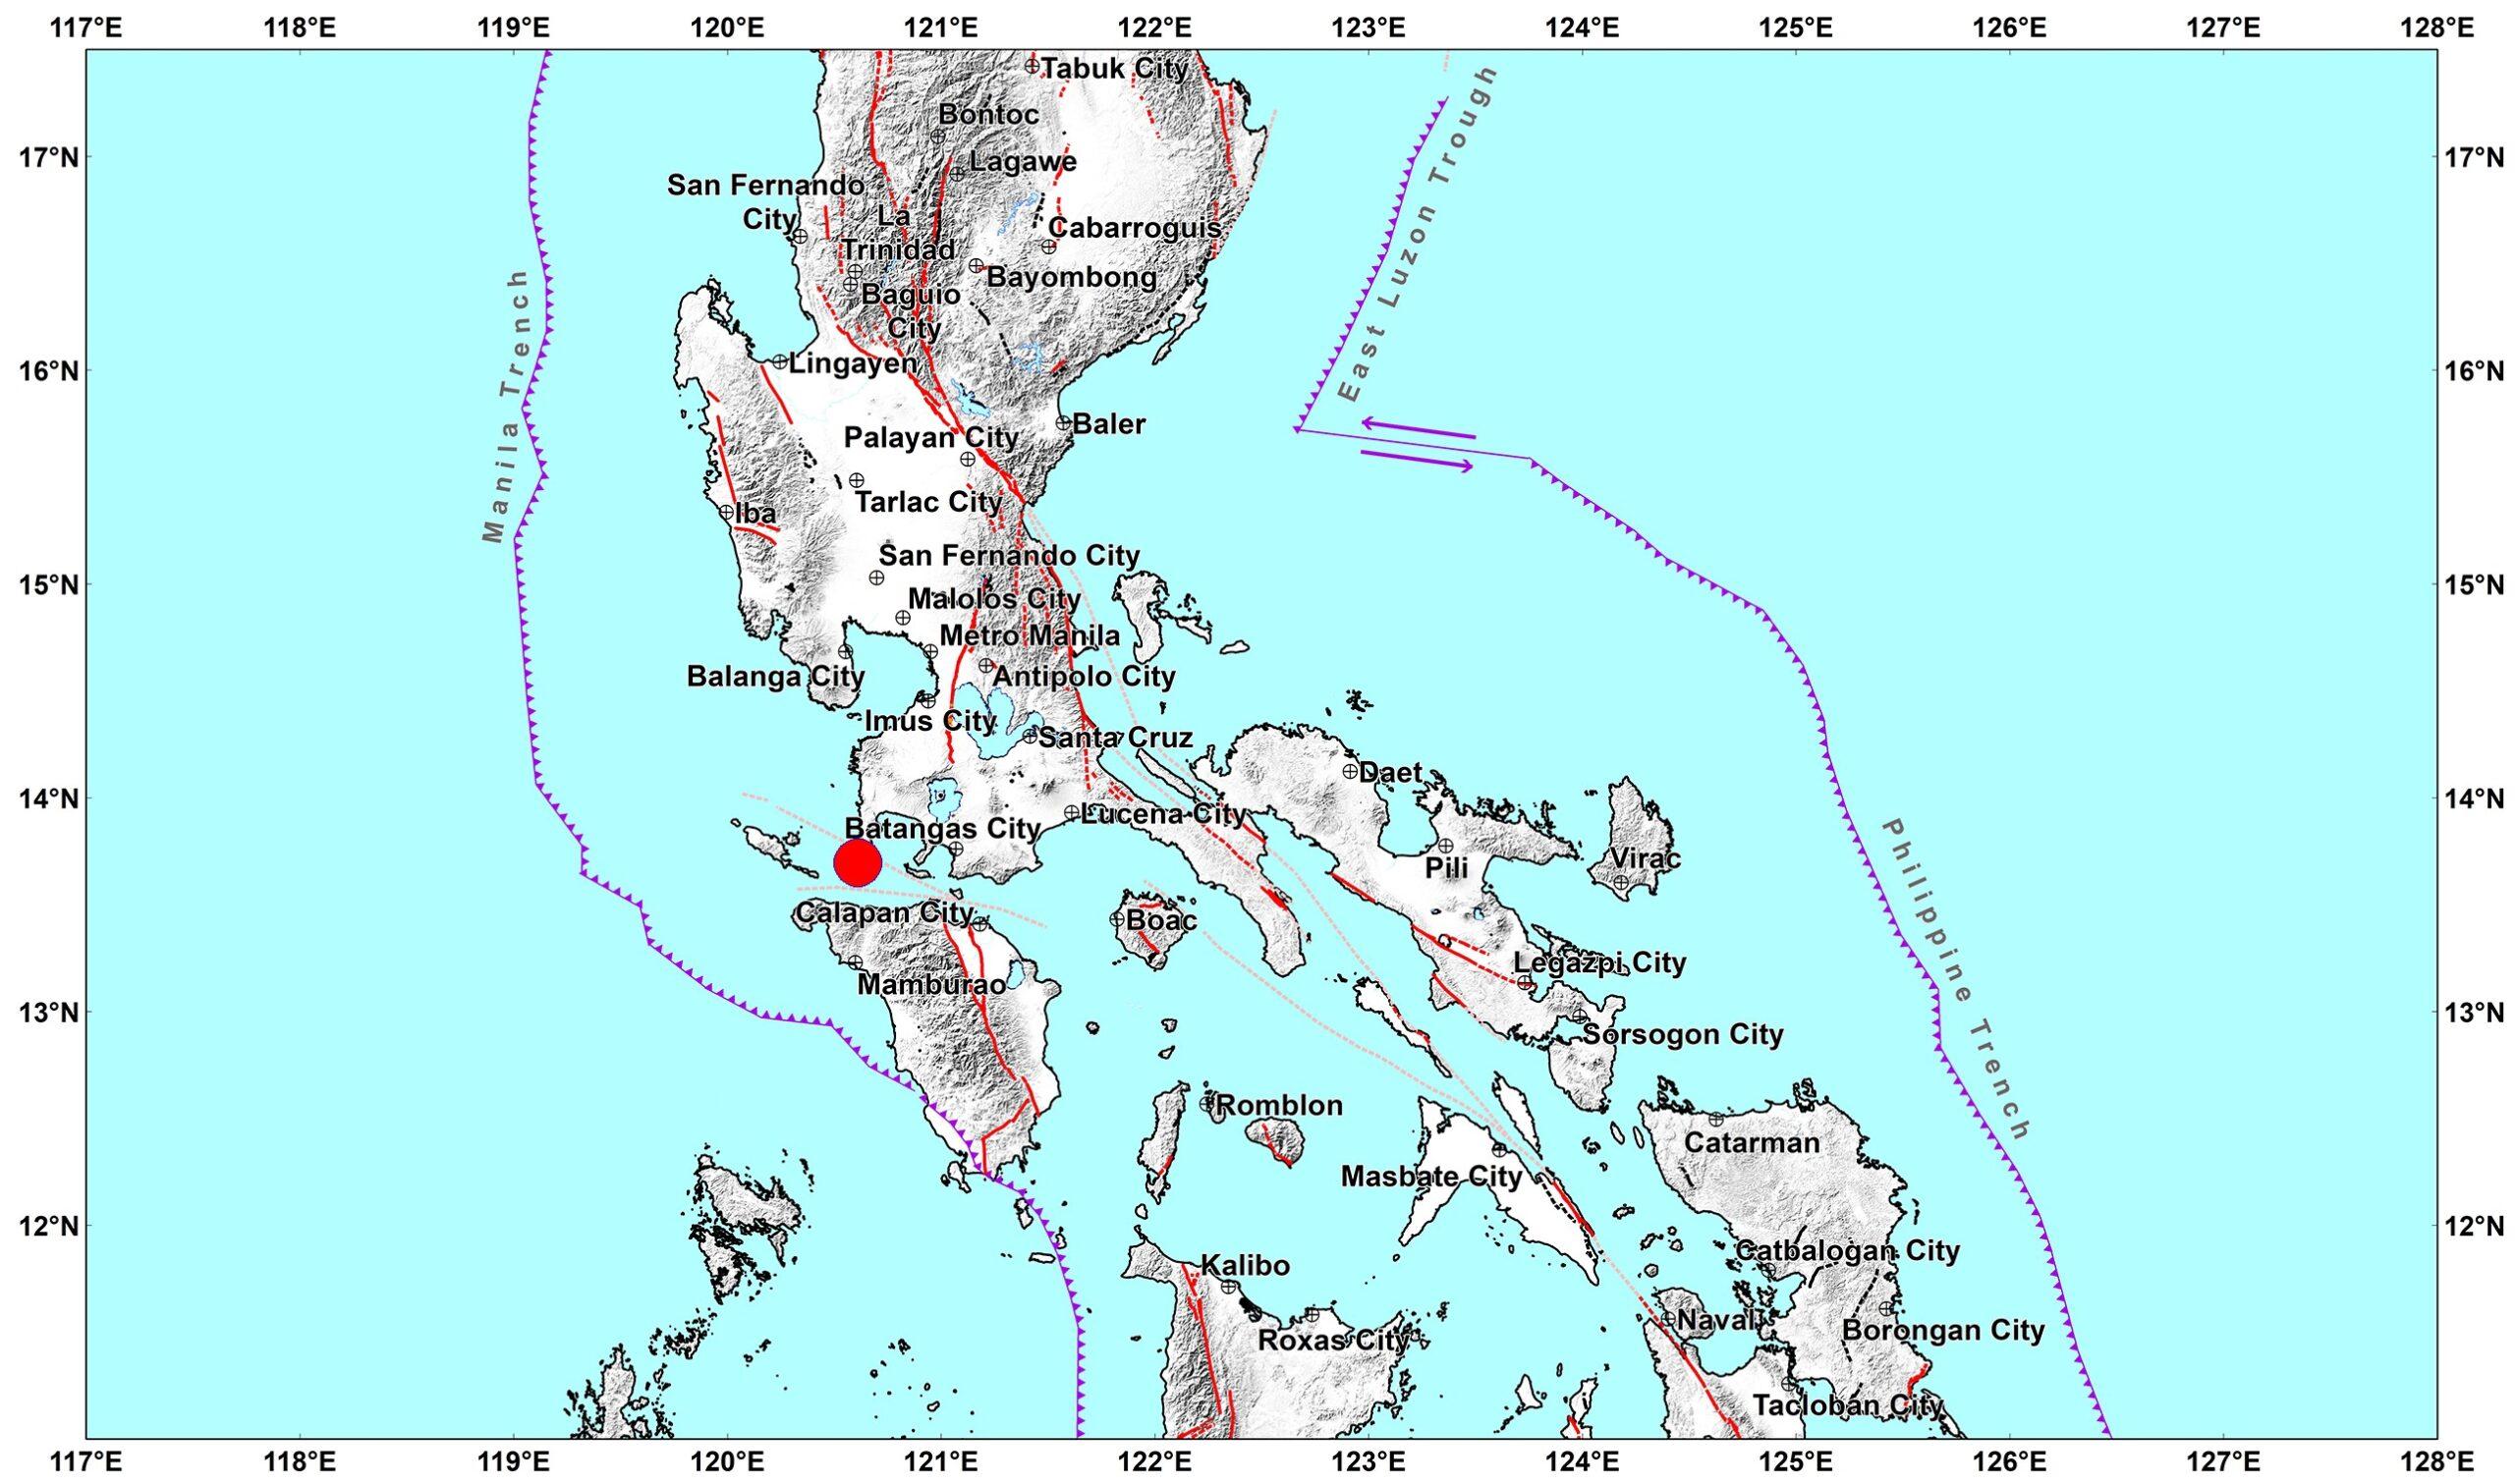 Magnitude 6.7 Earthquake Hits Batangas, Philippines